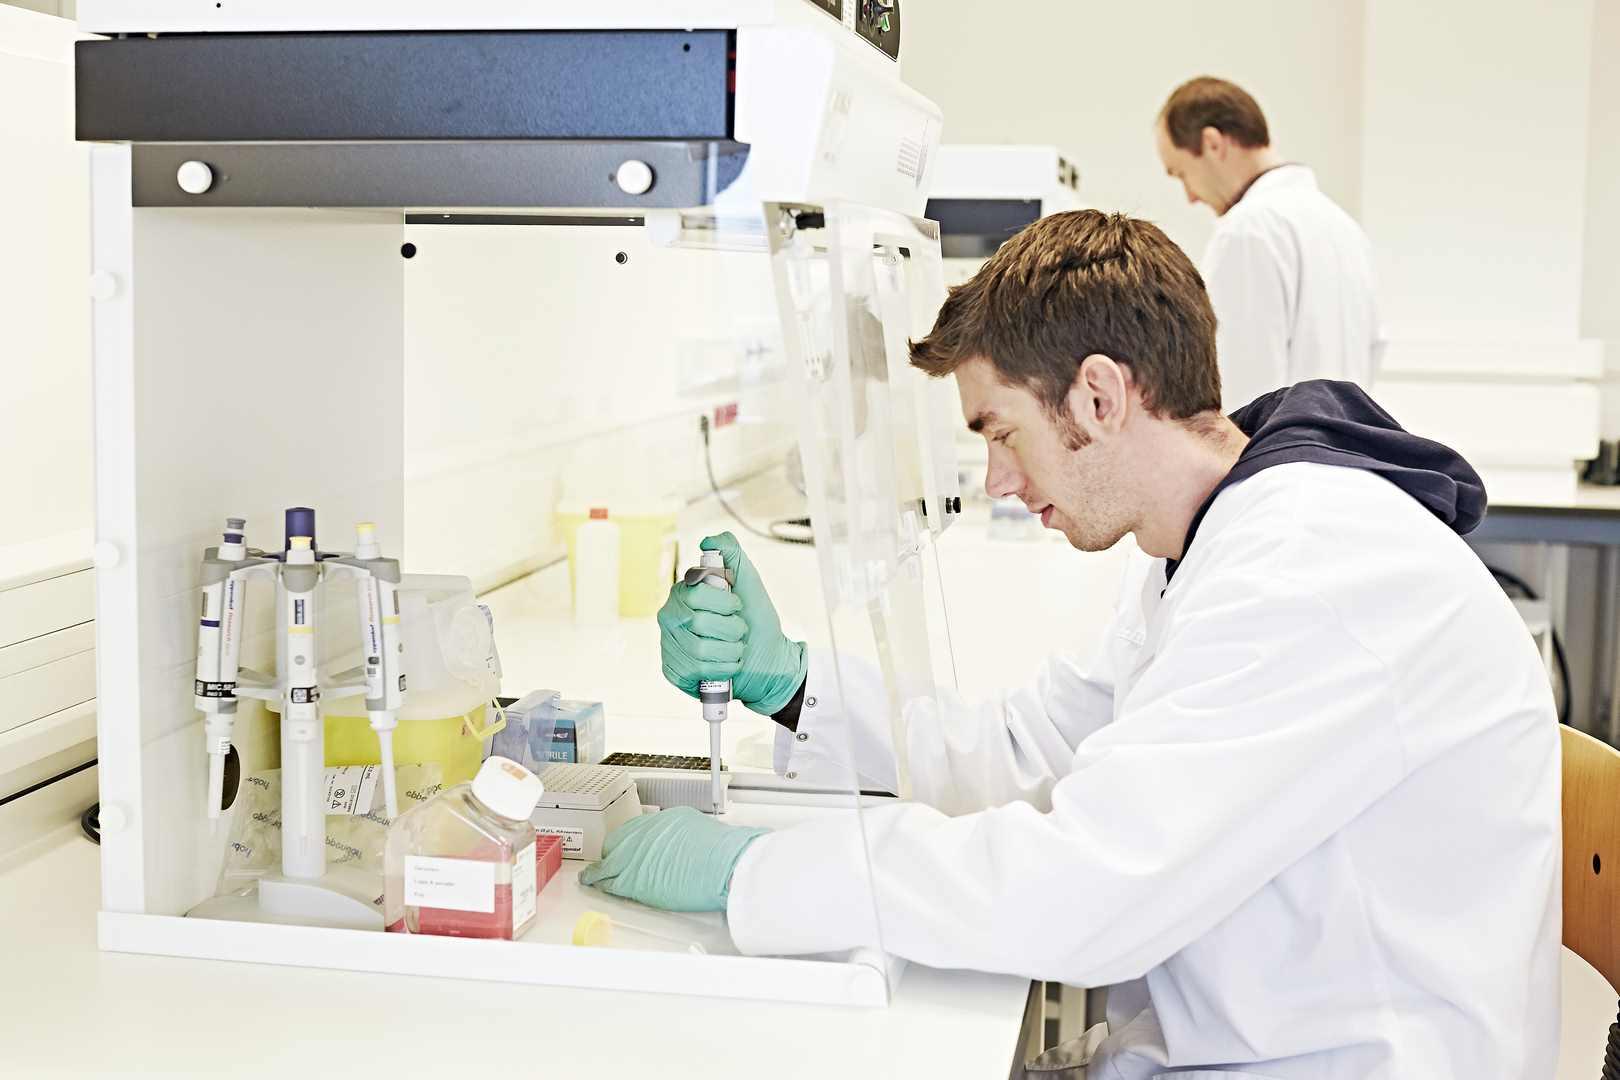 Quality Assistance Laboratory Scientist Biology